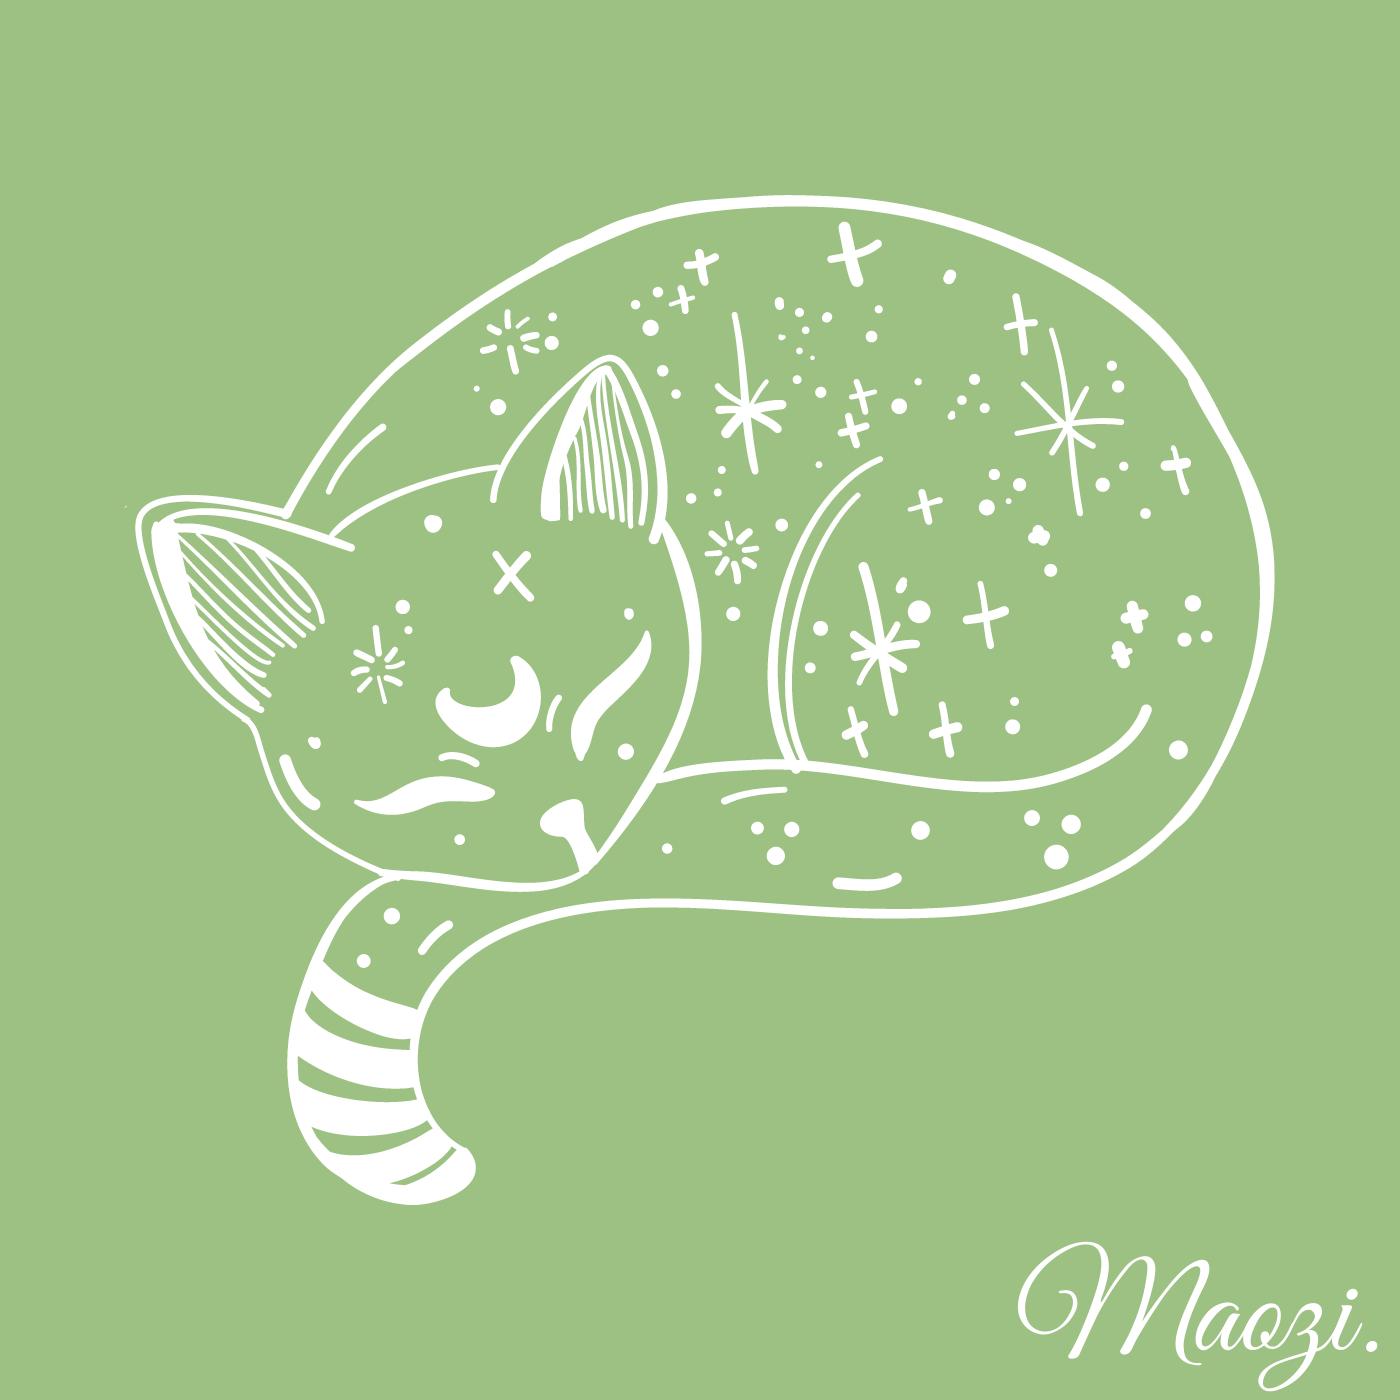 貓子 Maozi